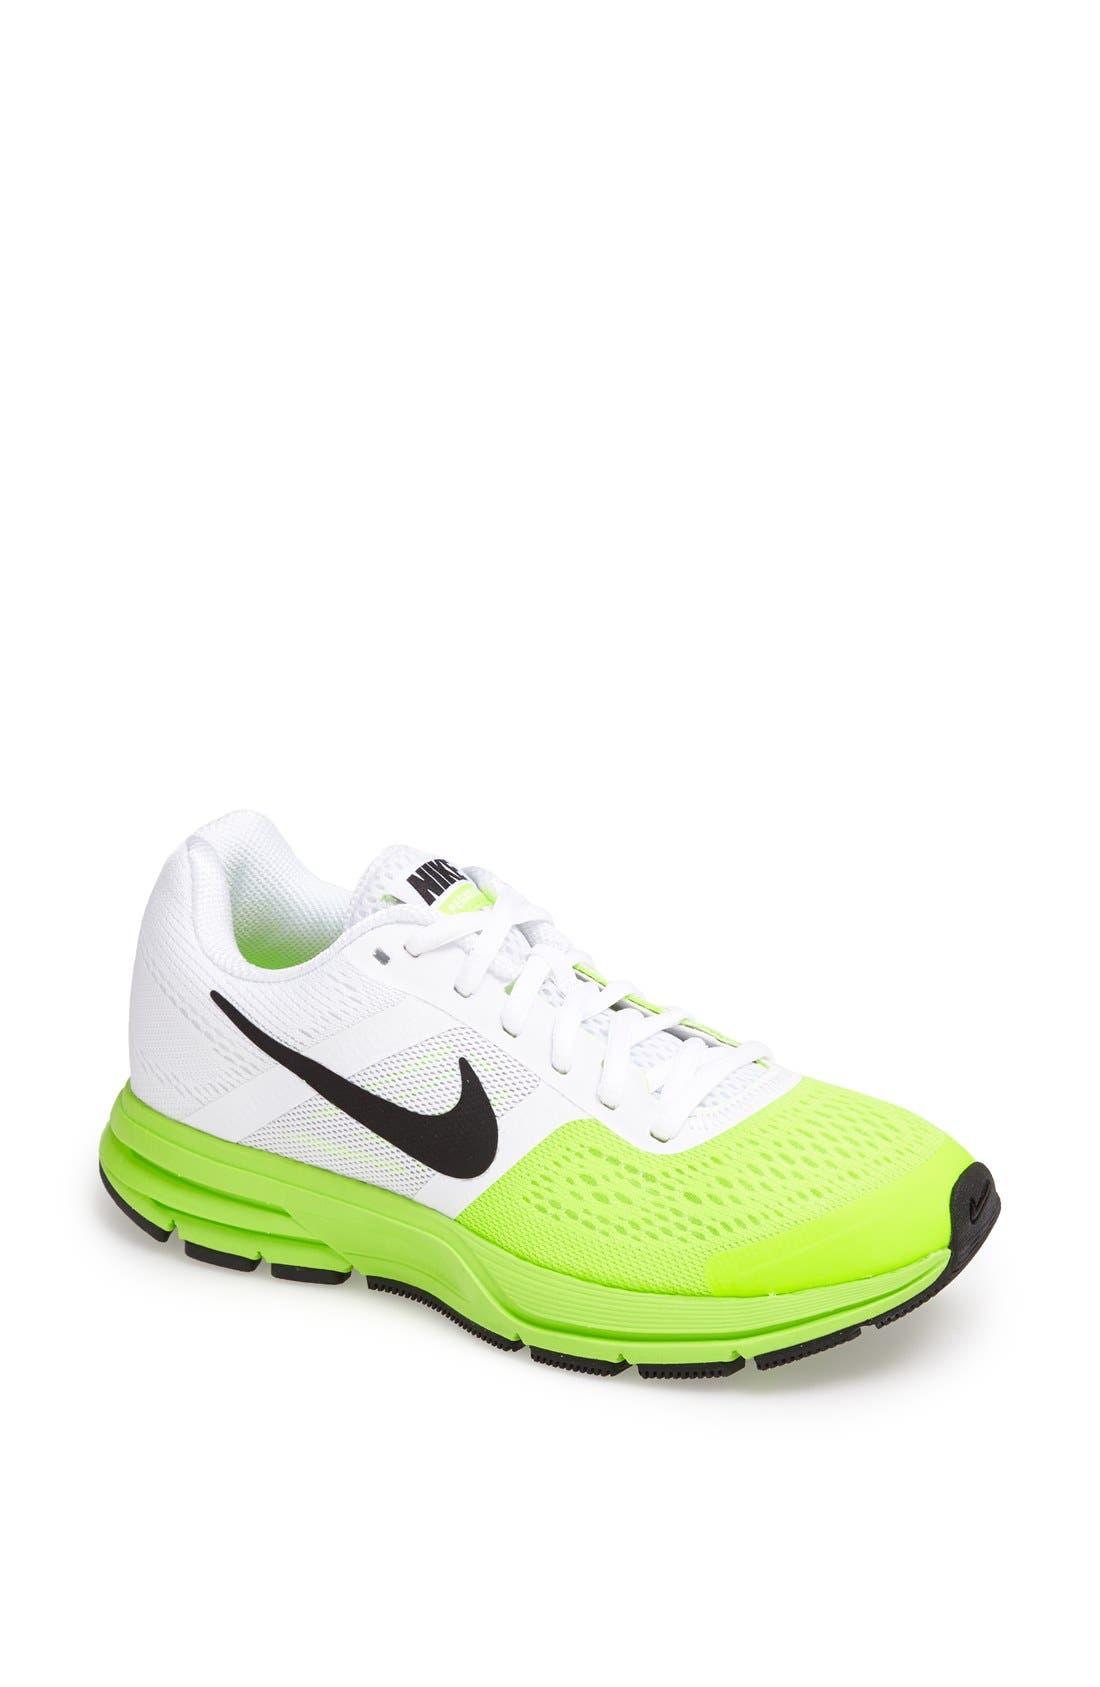 Alternate Image 1 Selected - Nike 'Air Pegasus+ 30' Running Shoe (Women)